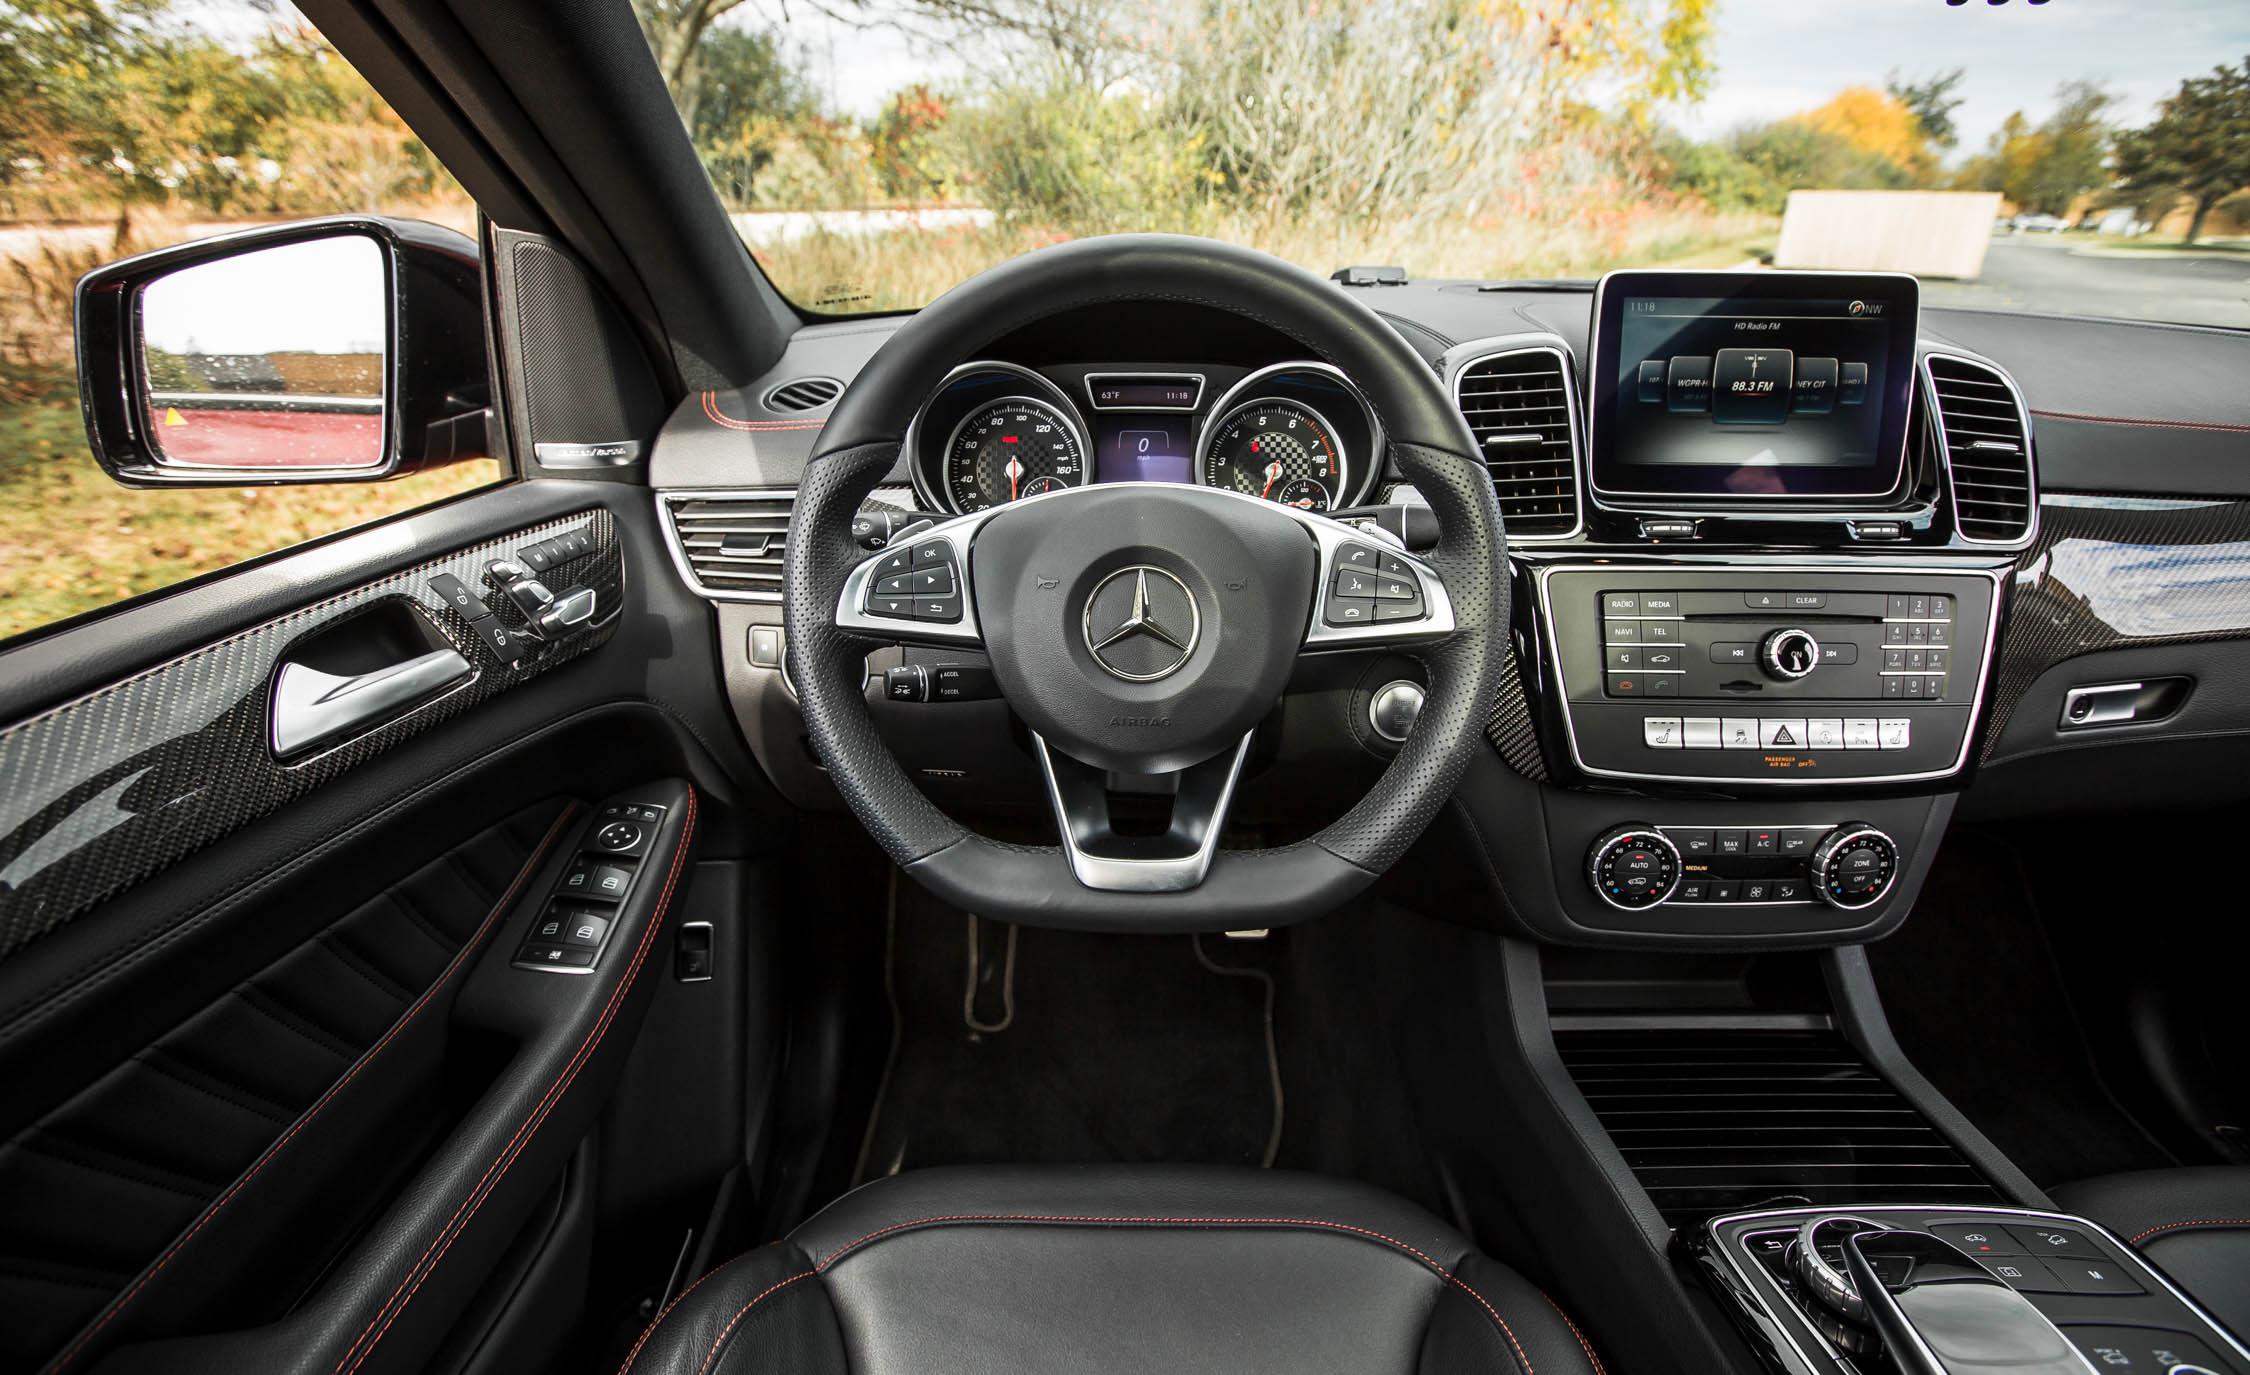 2016 Mercedes-Benz GLE450 AMG Coupe Interior Cockpit